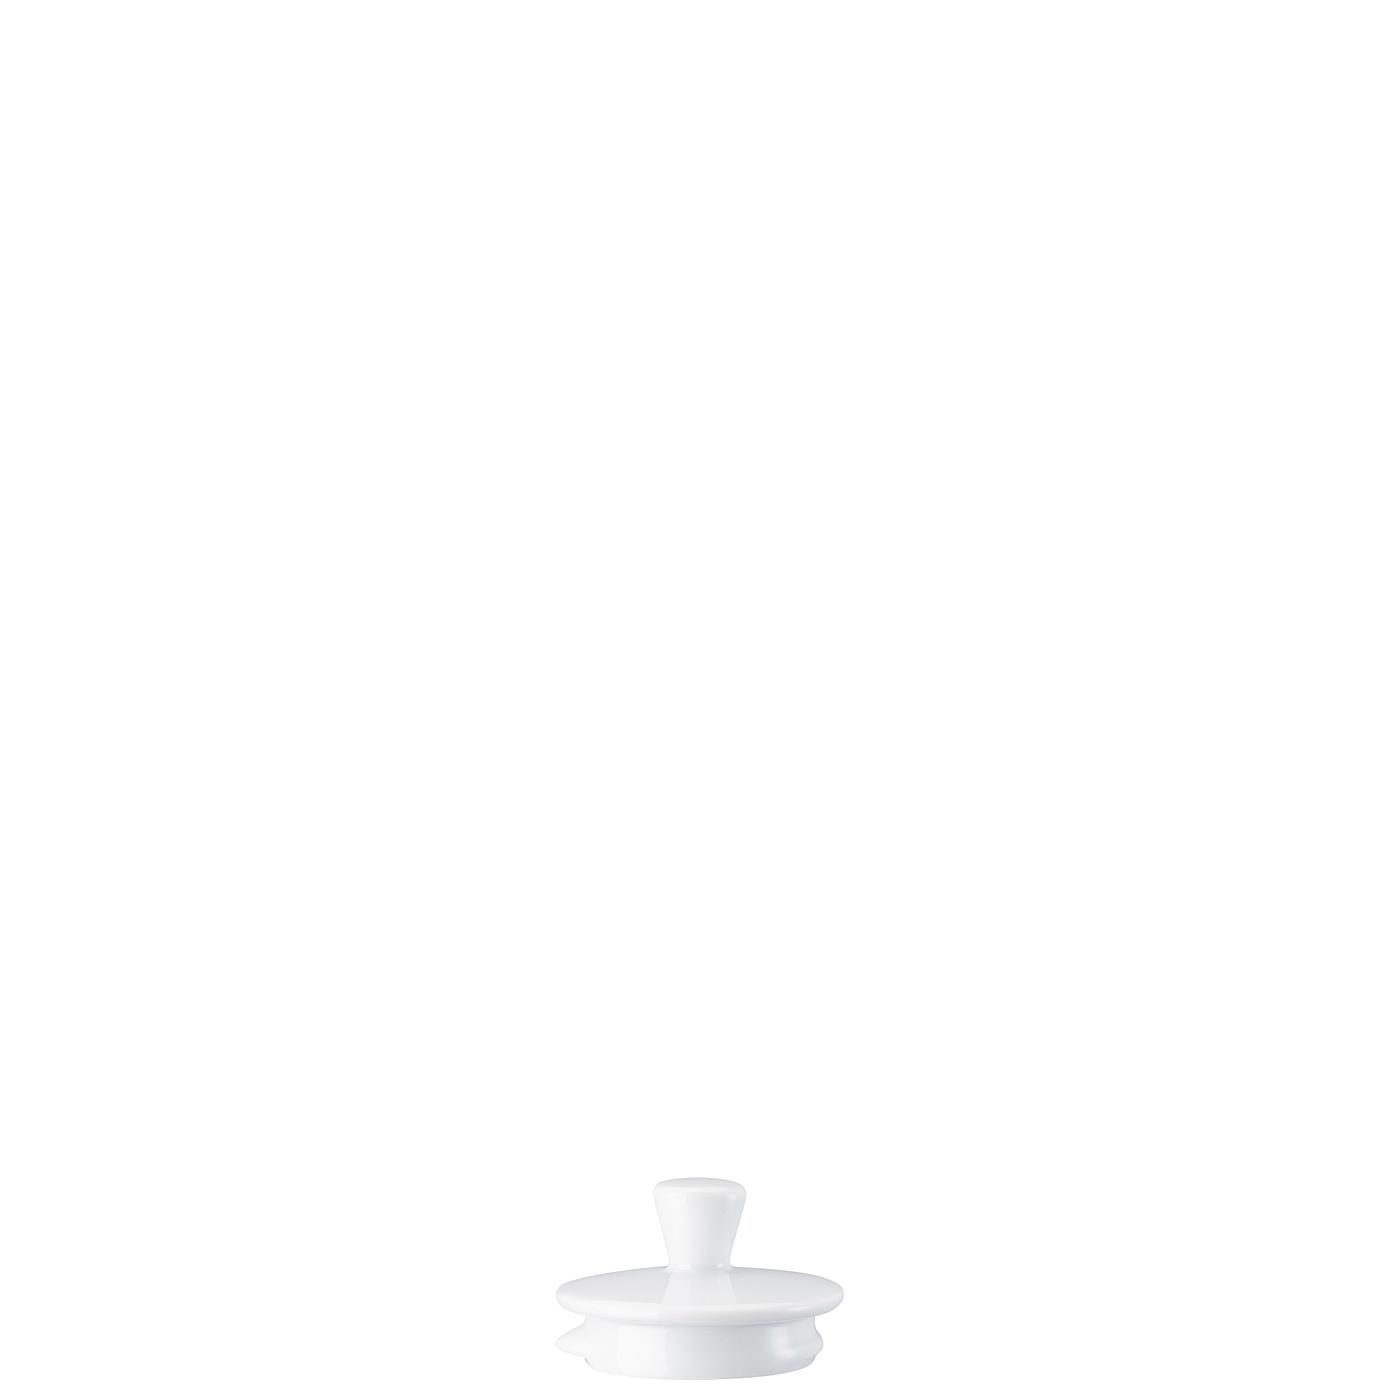 Kaffeekanne 6 P. Deckel Form 1382 Weiss Arzberg